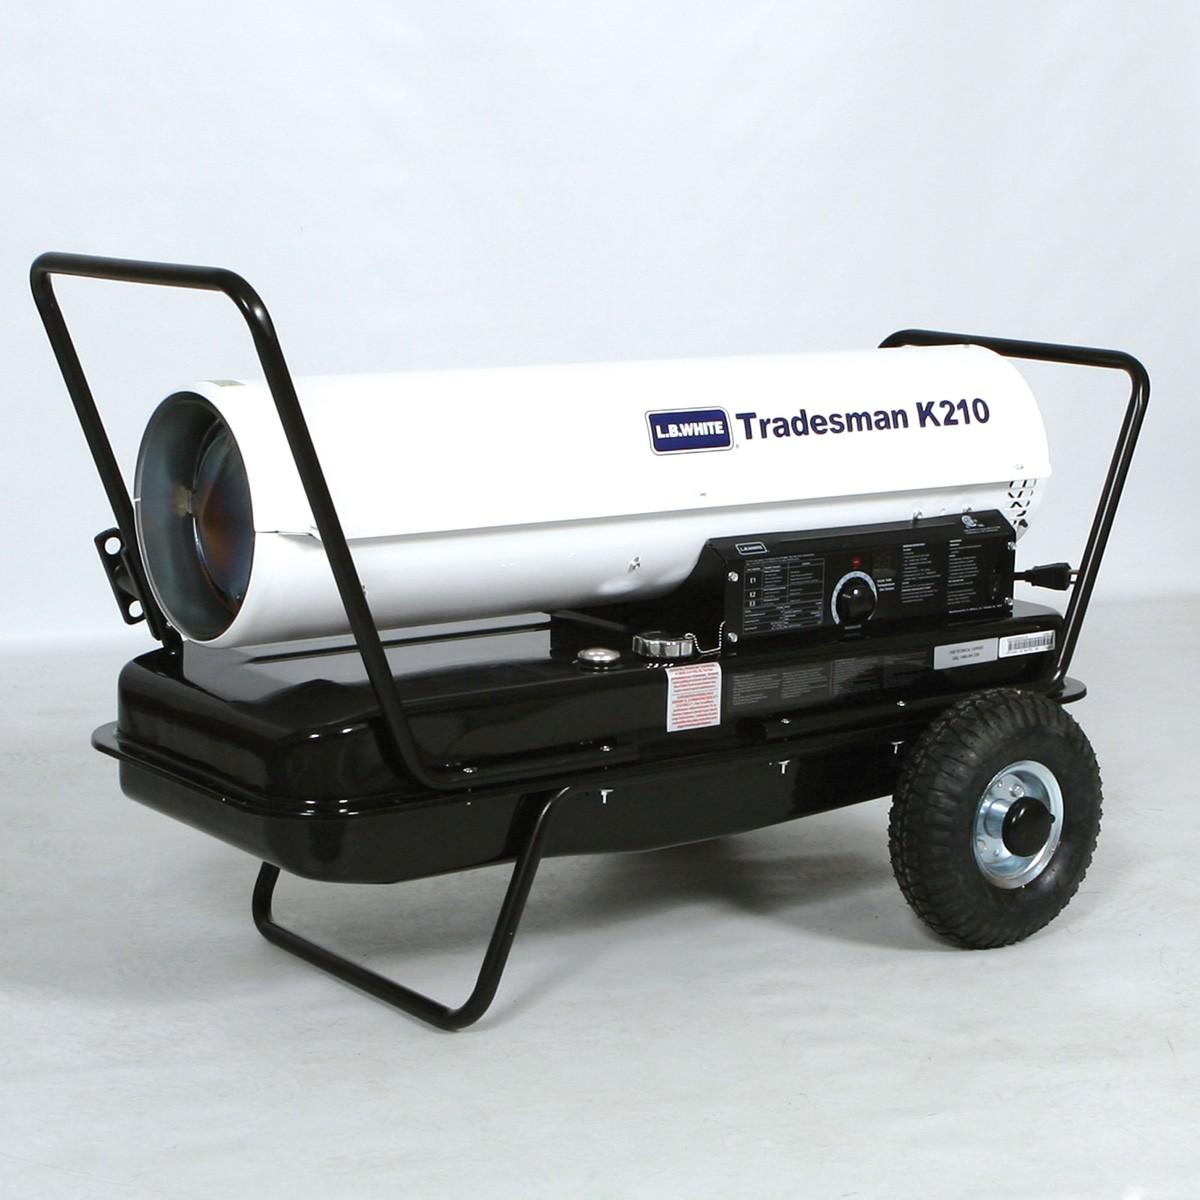 Calentador L.B. White Tradesman K210 Diesel